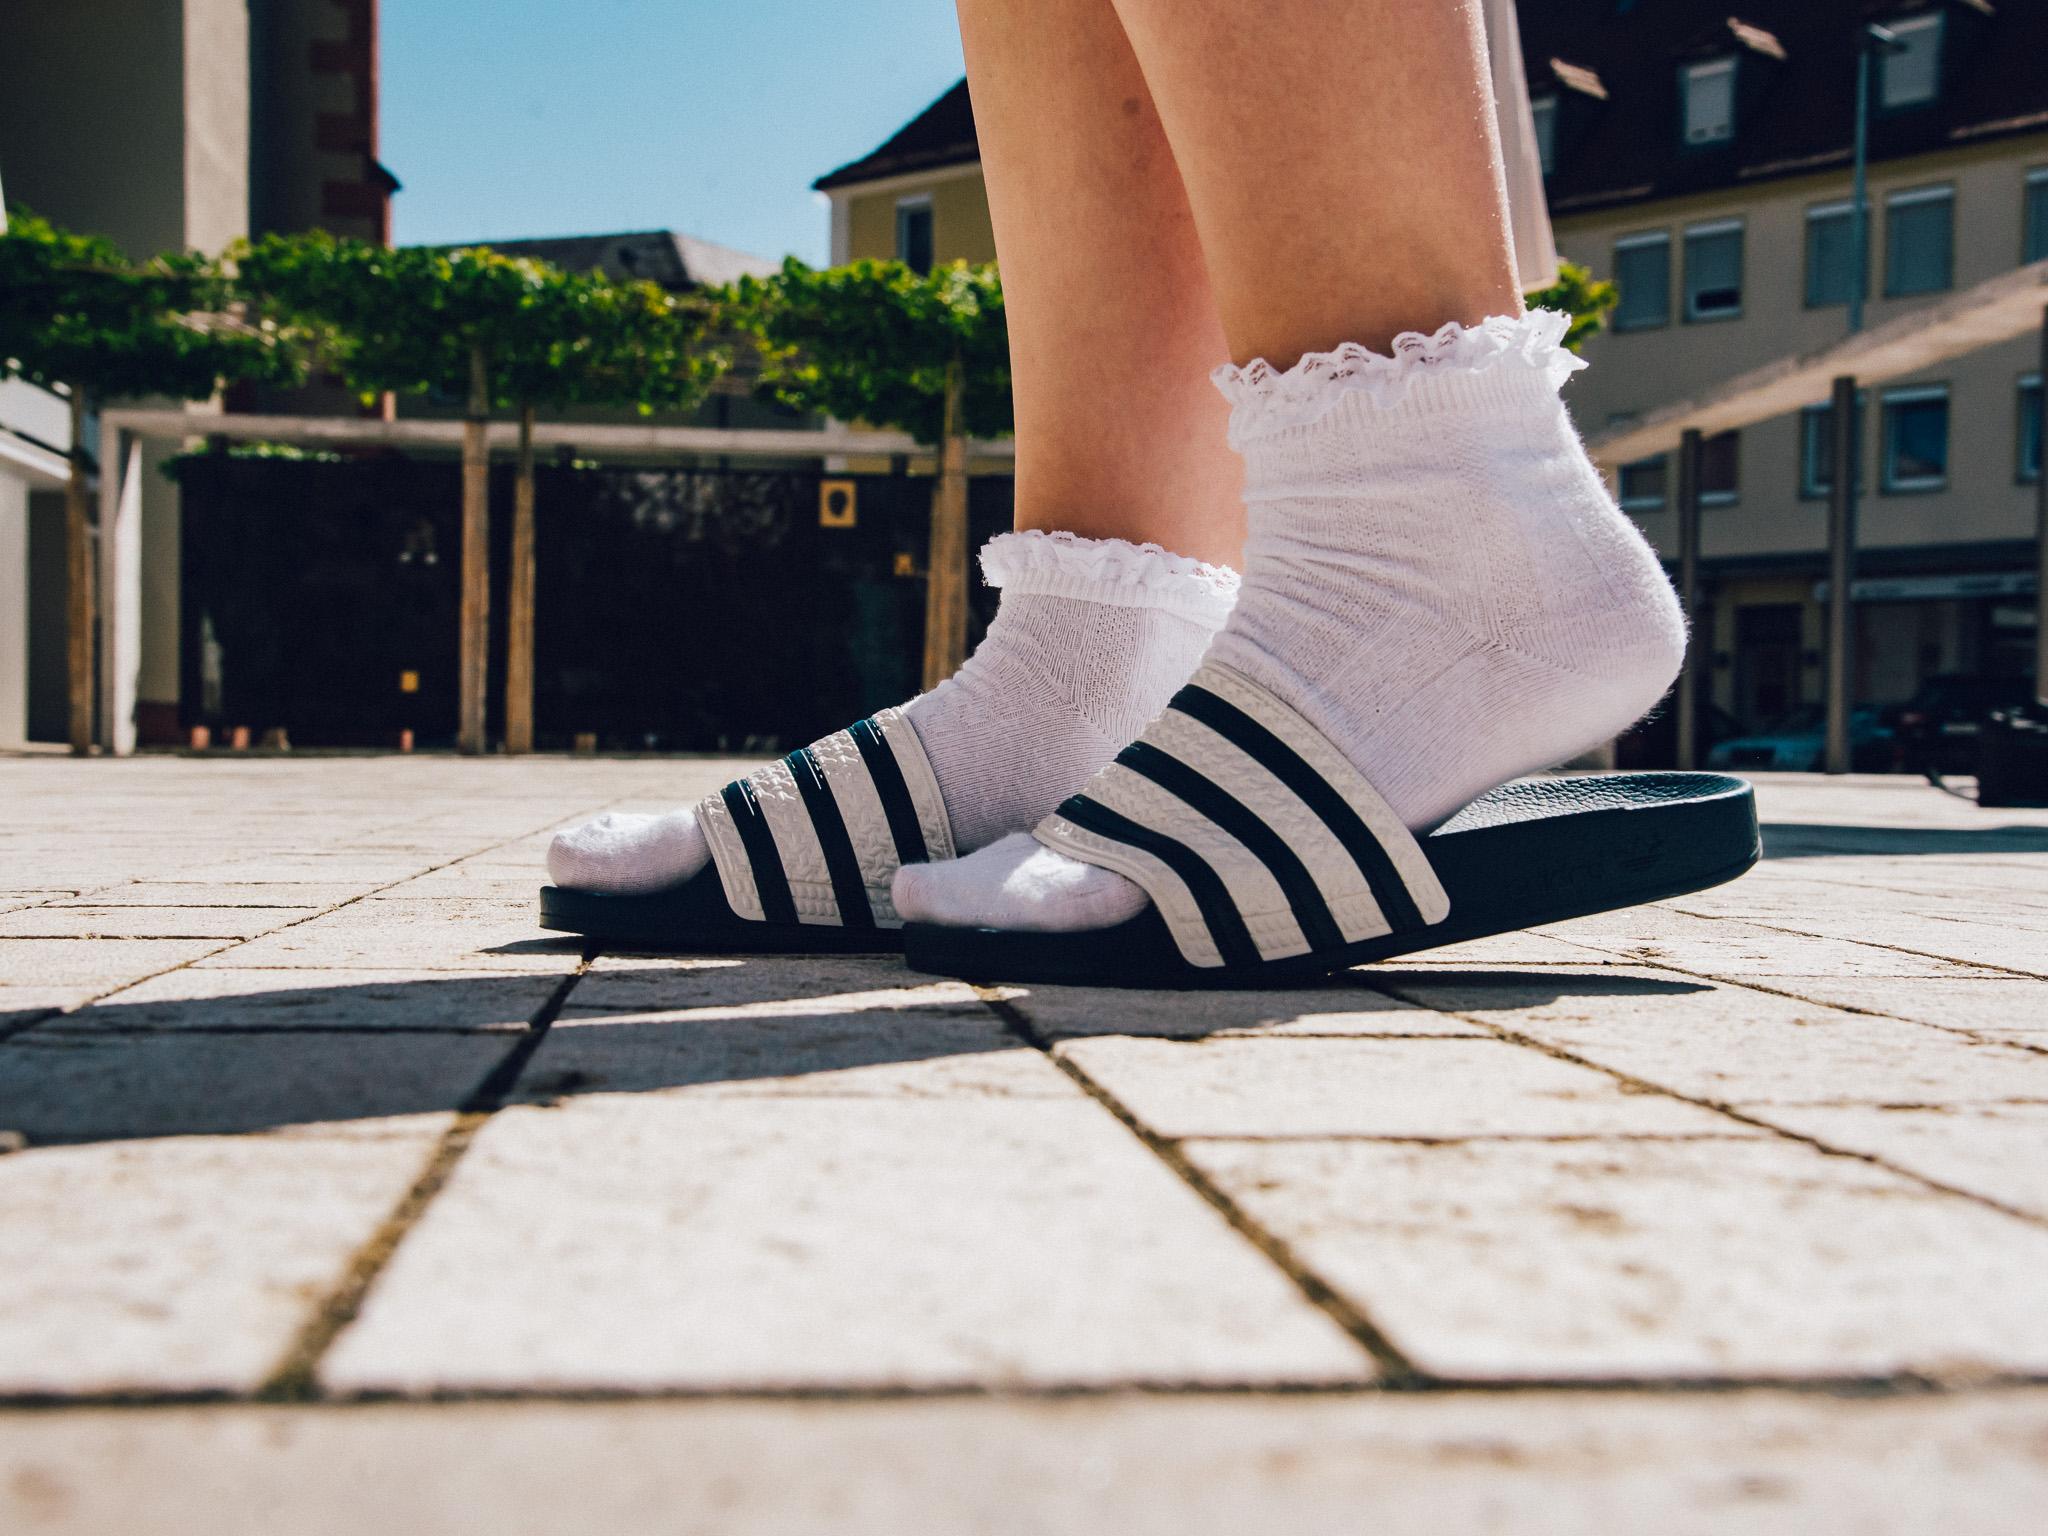 Sandalen und Socken. Foto: Pascal Höfig